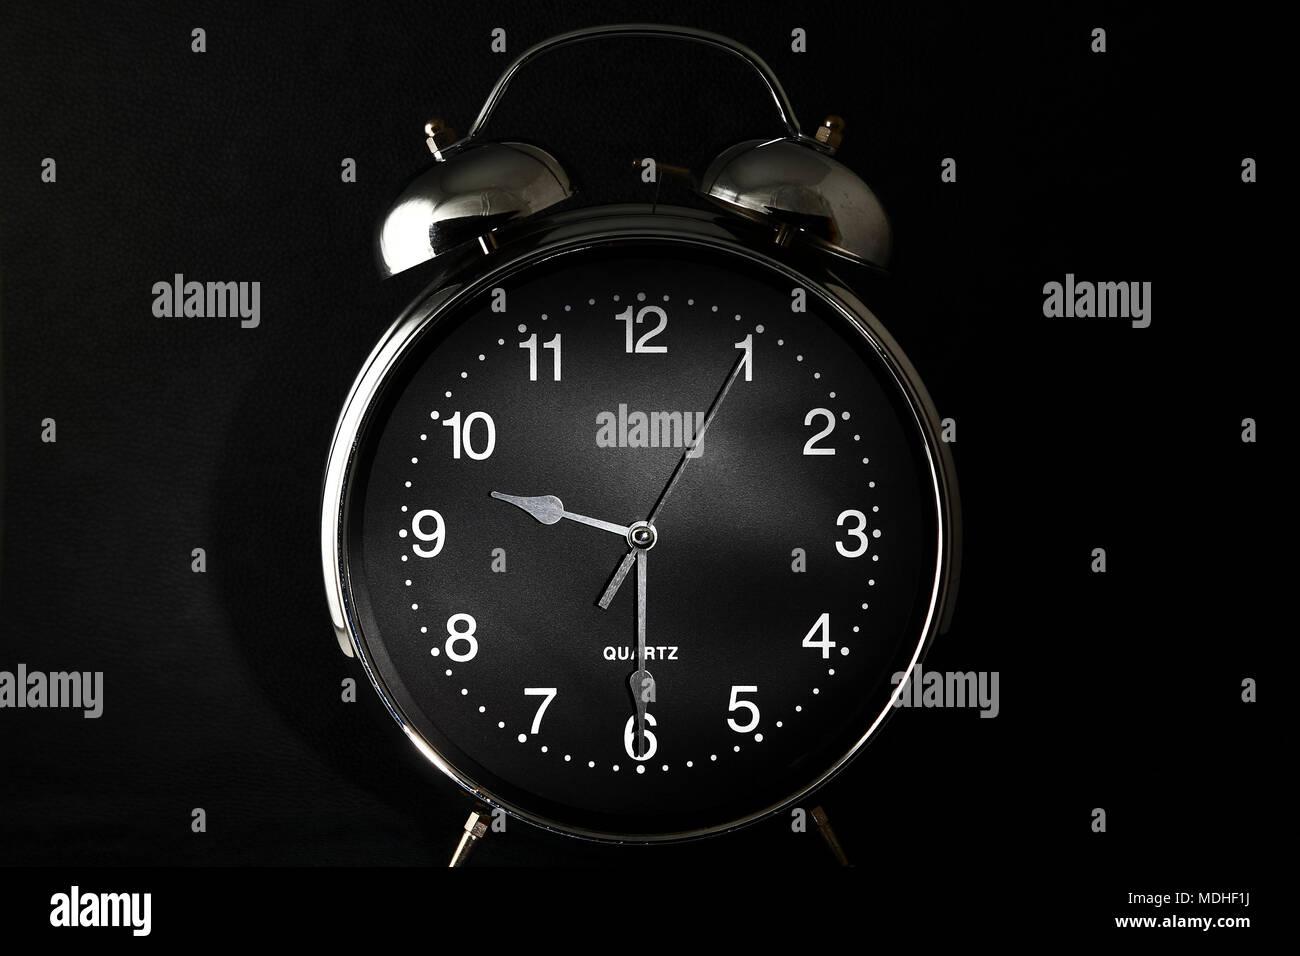 Pm Retro Con Las 9 Antiguo Am O 30 Despertador Manos A Reloj uTXZOPik